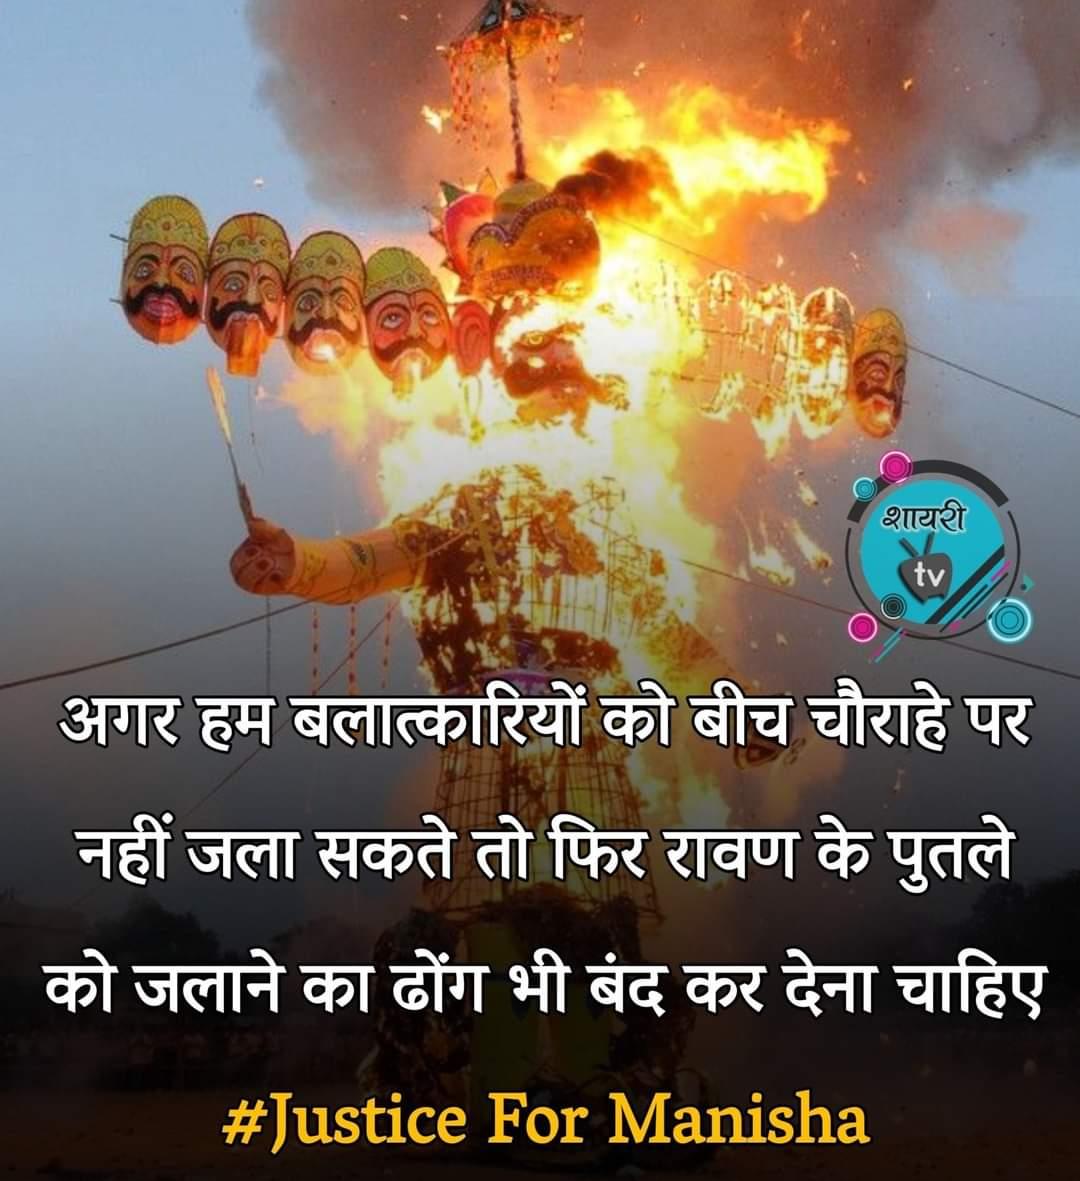 @myogioffice @myogiadityanath @dgpup @hathraspolice @chitraaum @republic @PMOIndia @narendramodi